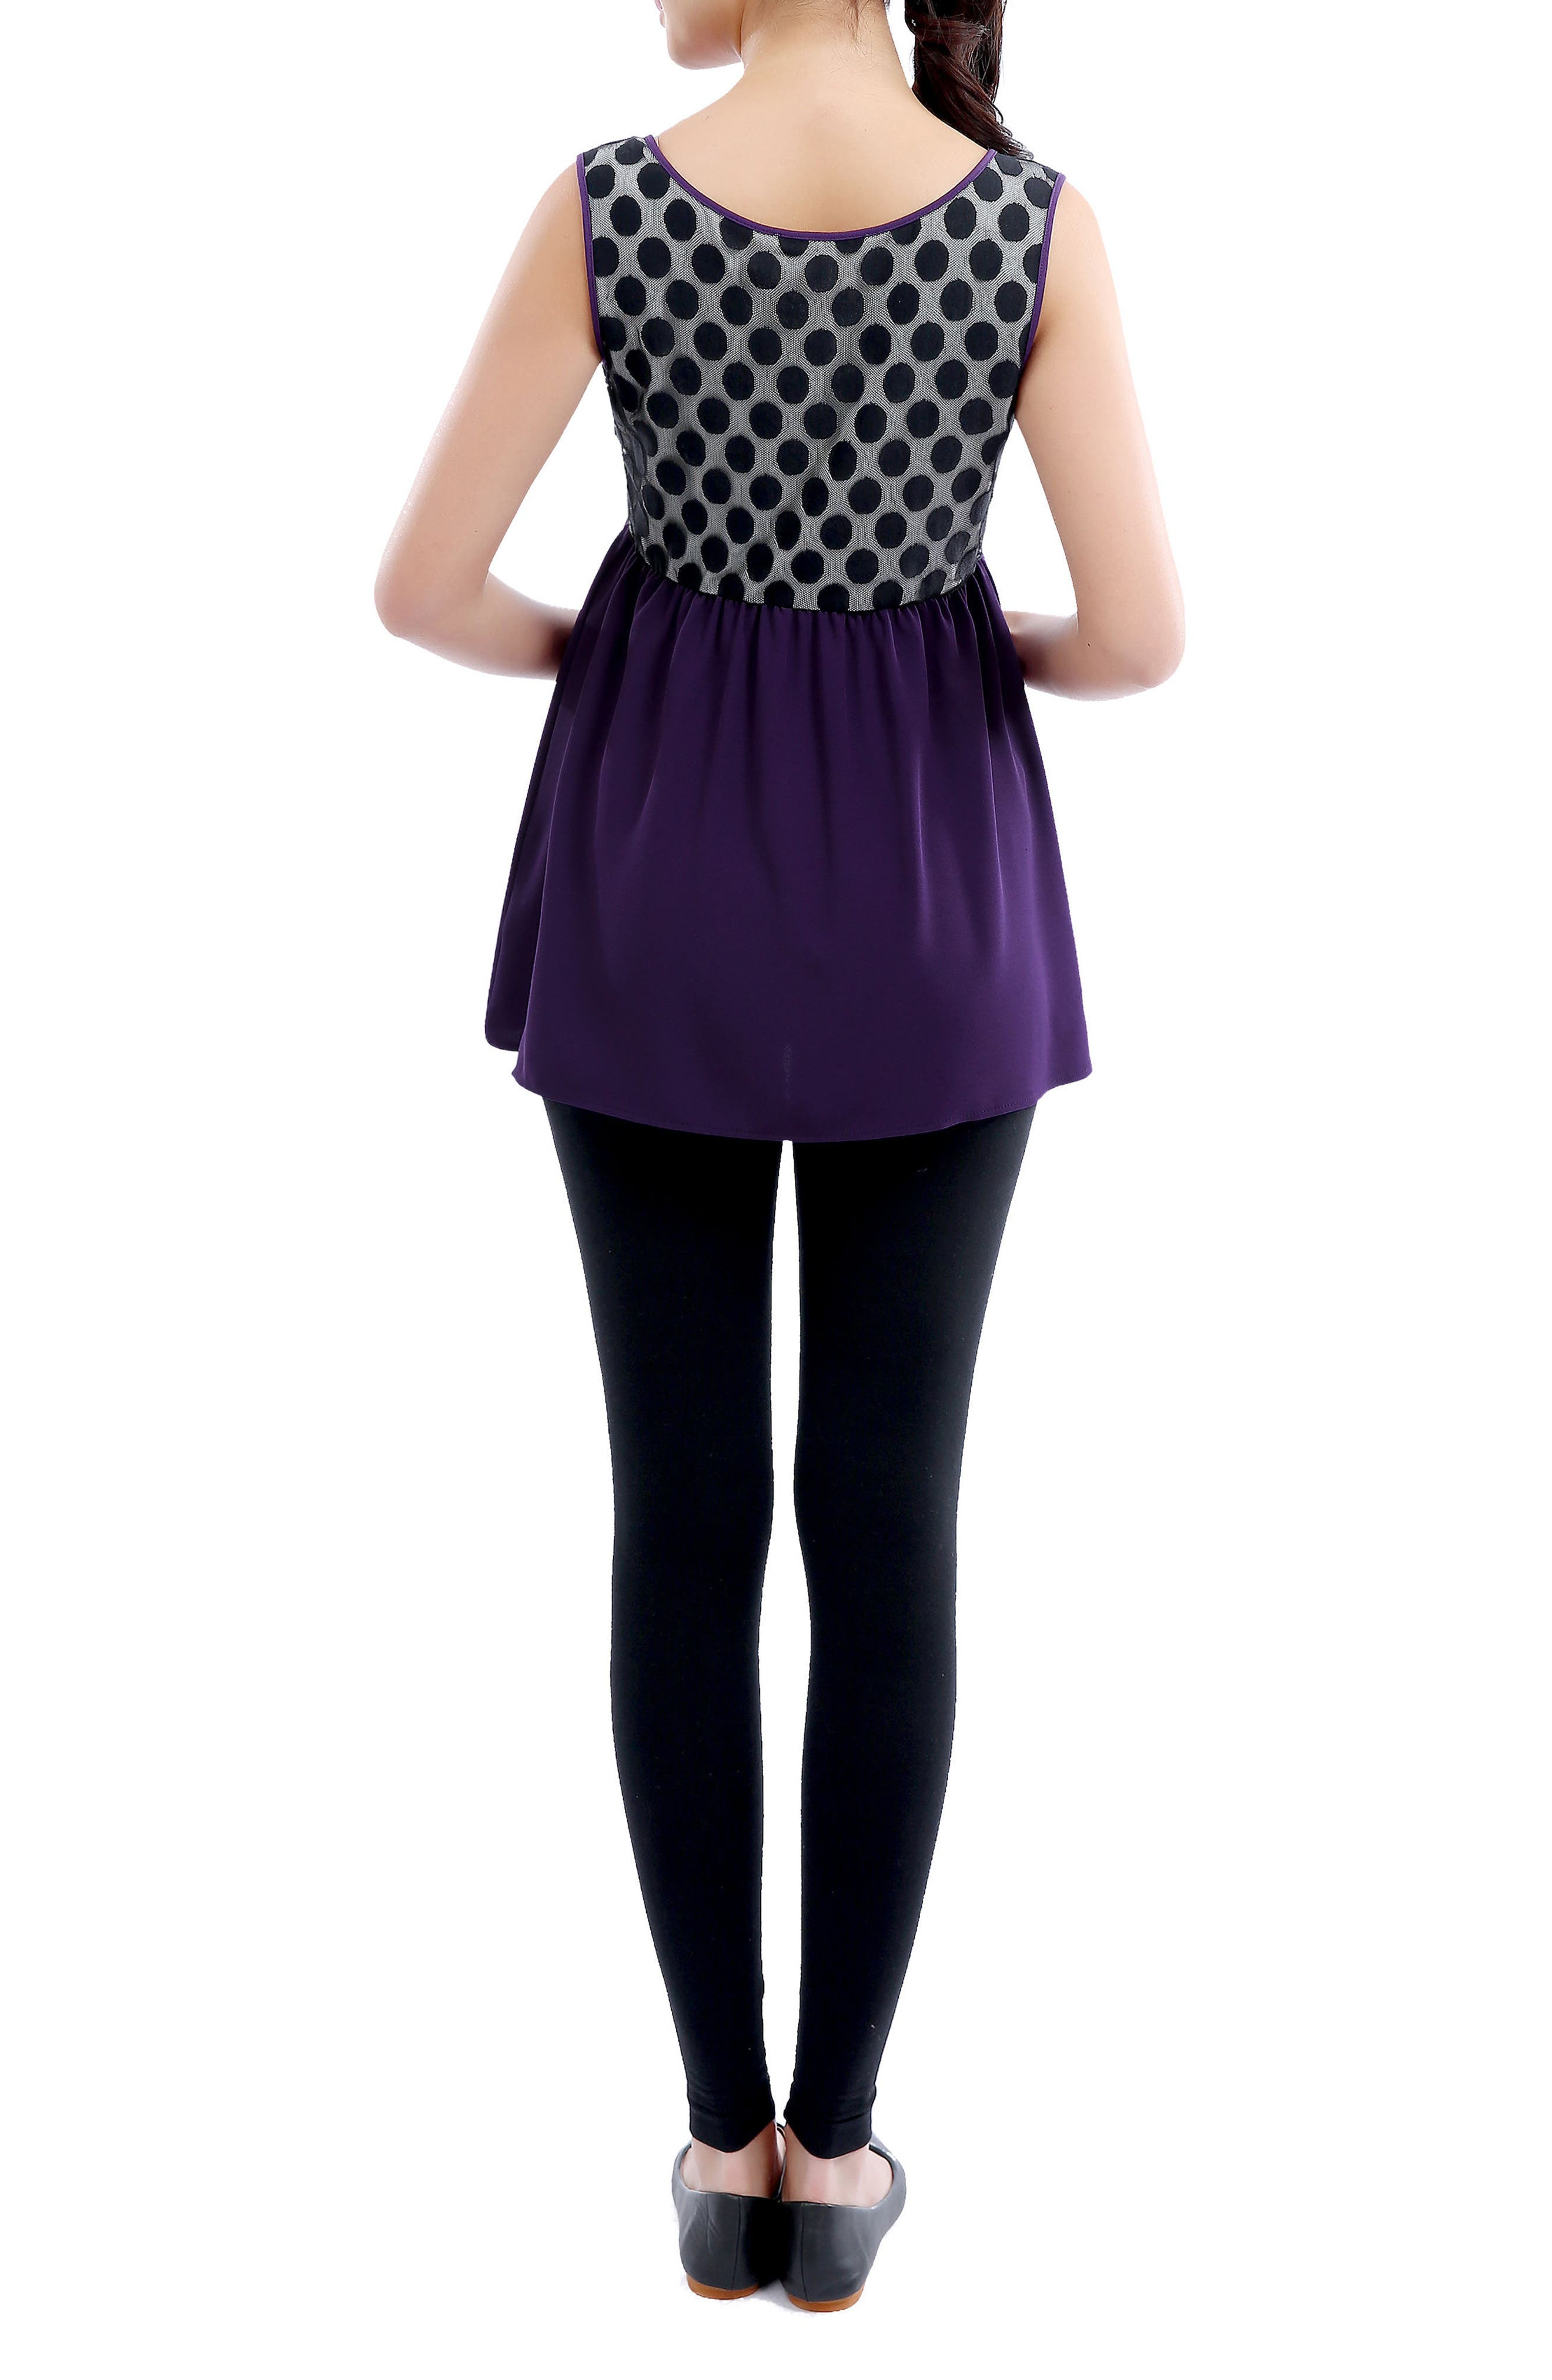 Alternate Image 2  - Kimi and Kai 'Amber' Polka Dot Lace Back Maternity Top